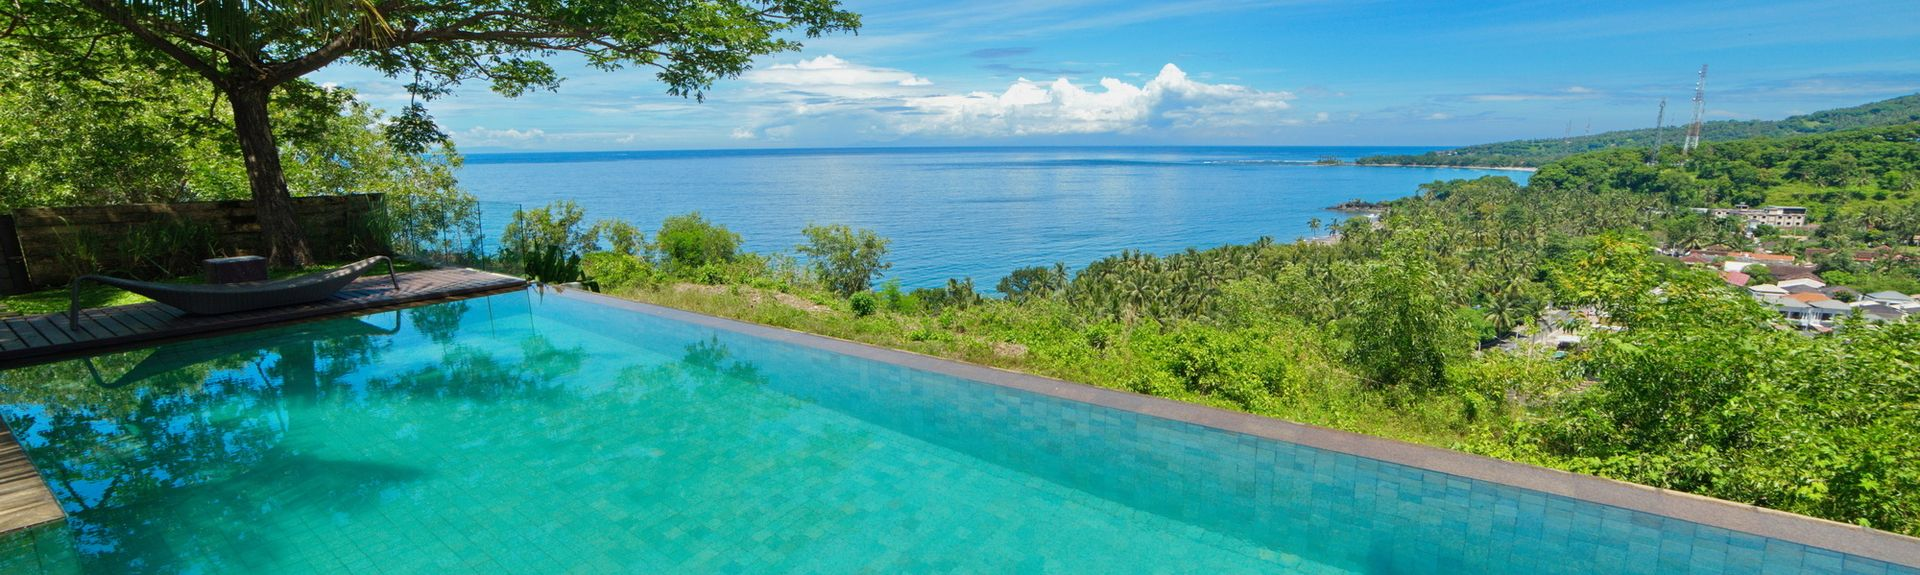 Kediri, Nusa Tenggara occidental, Indonésie